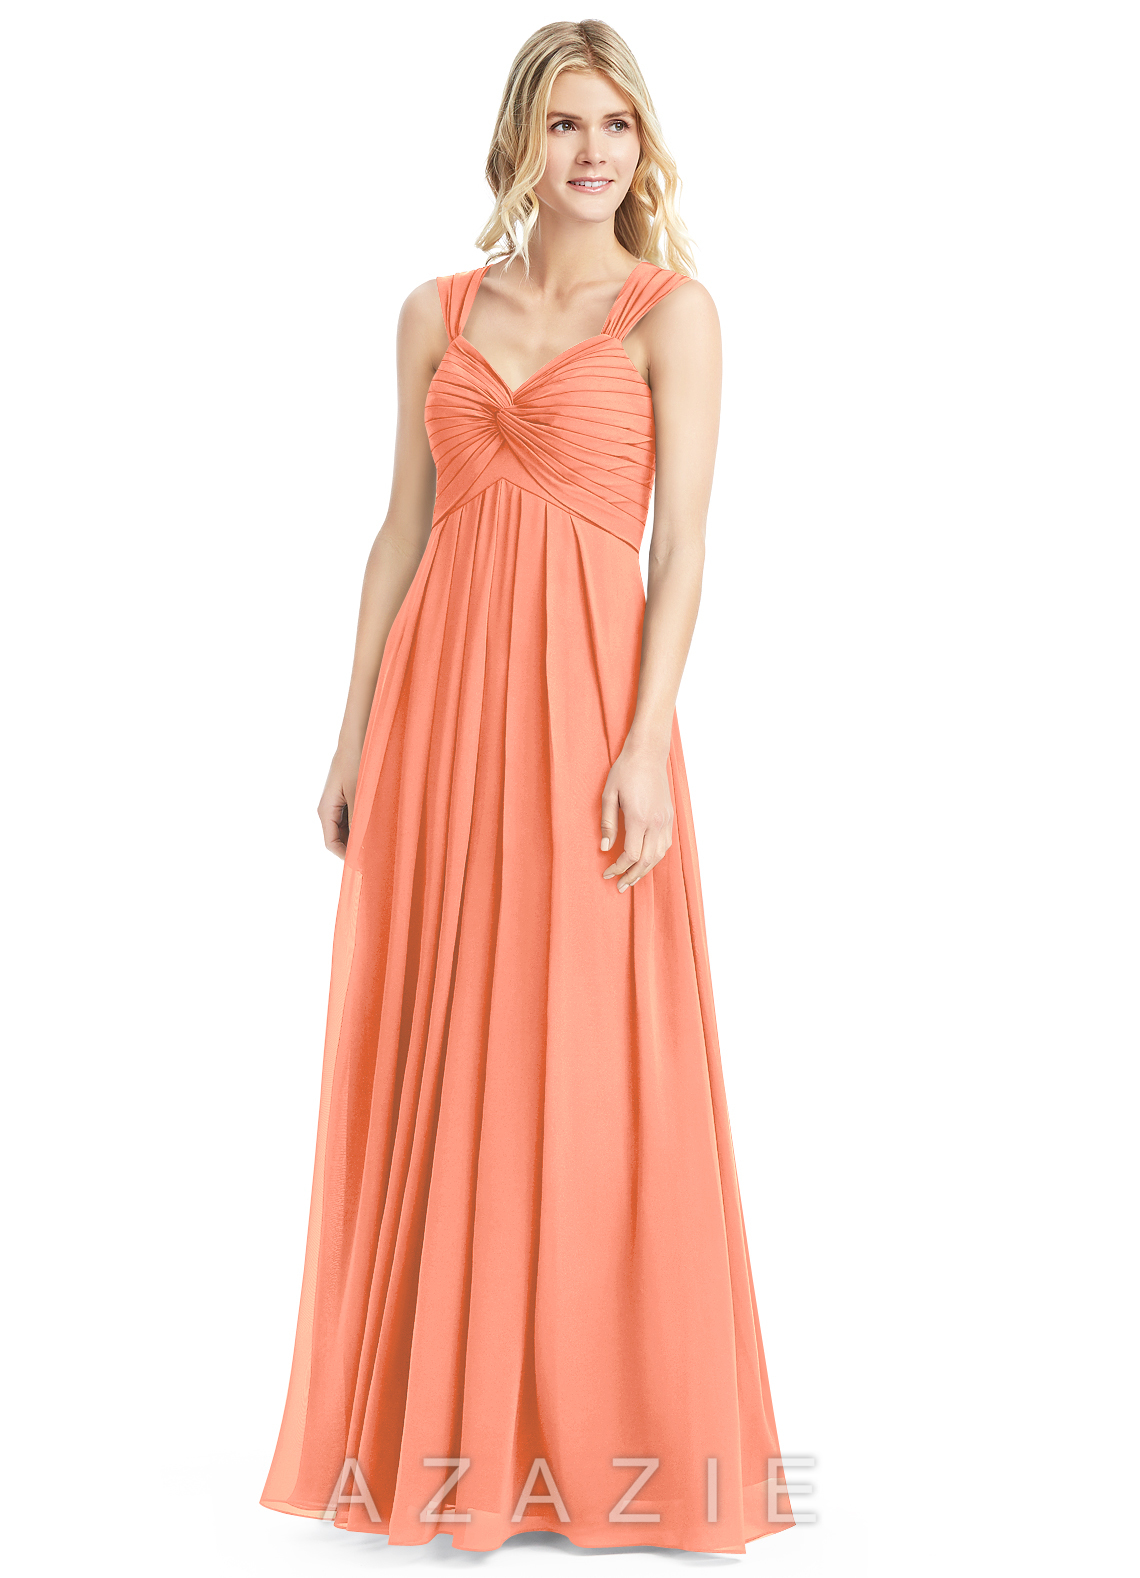 Azazie kaitlynn bridesmaid dress azazie loading zoom ombrellifo Gallery